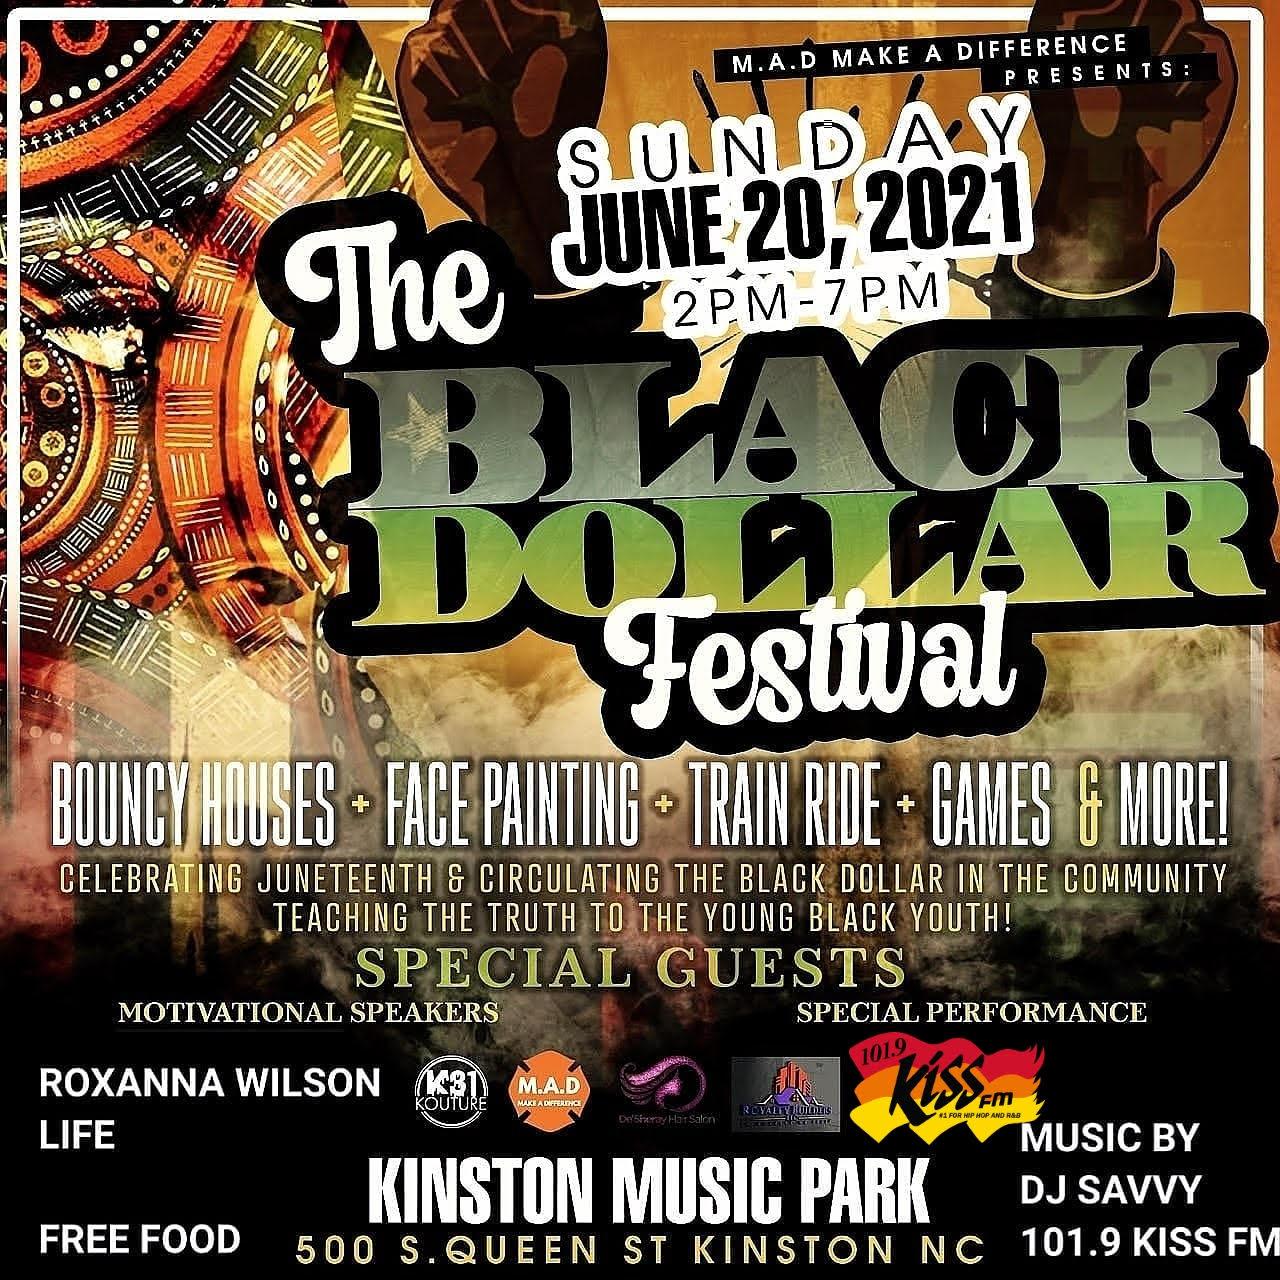 The Black Dollar Festival: Sunday, June 20th – 2pm-7pm